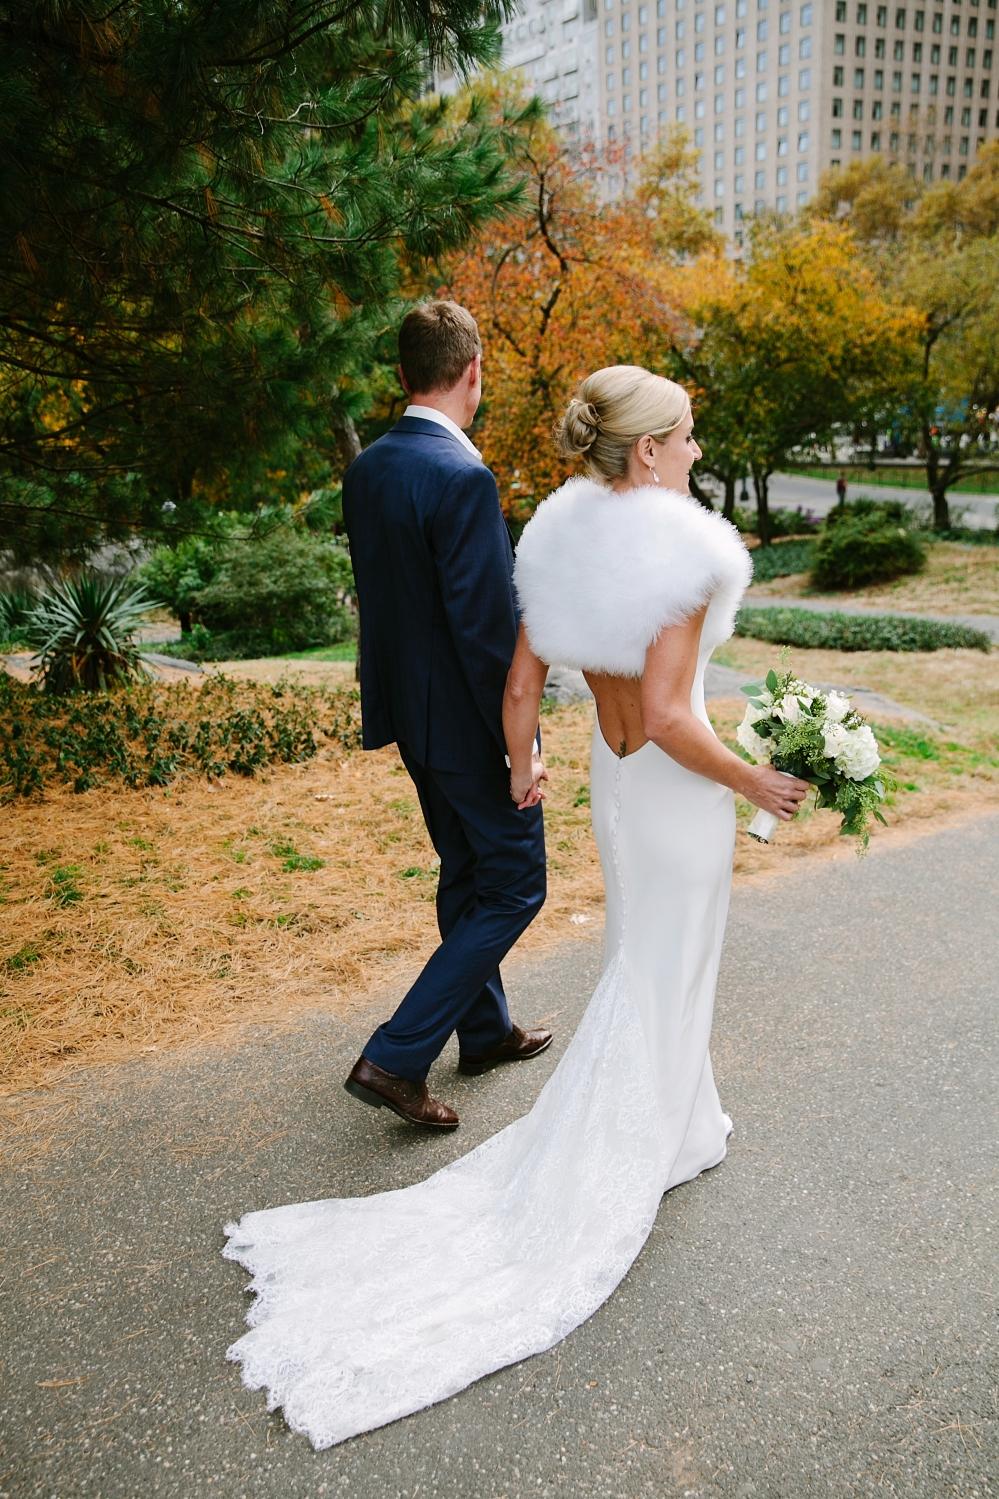 Copcot_centralpark_wedding_TS-258